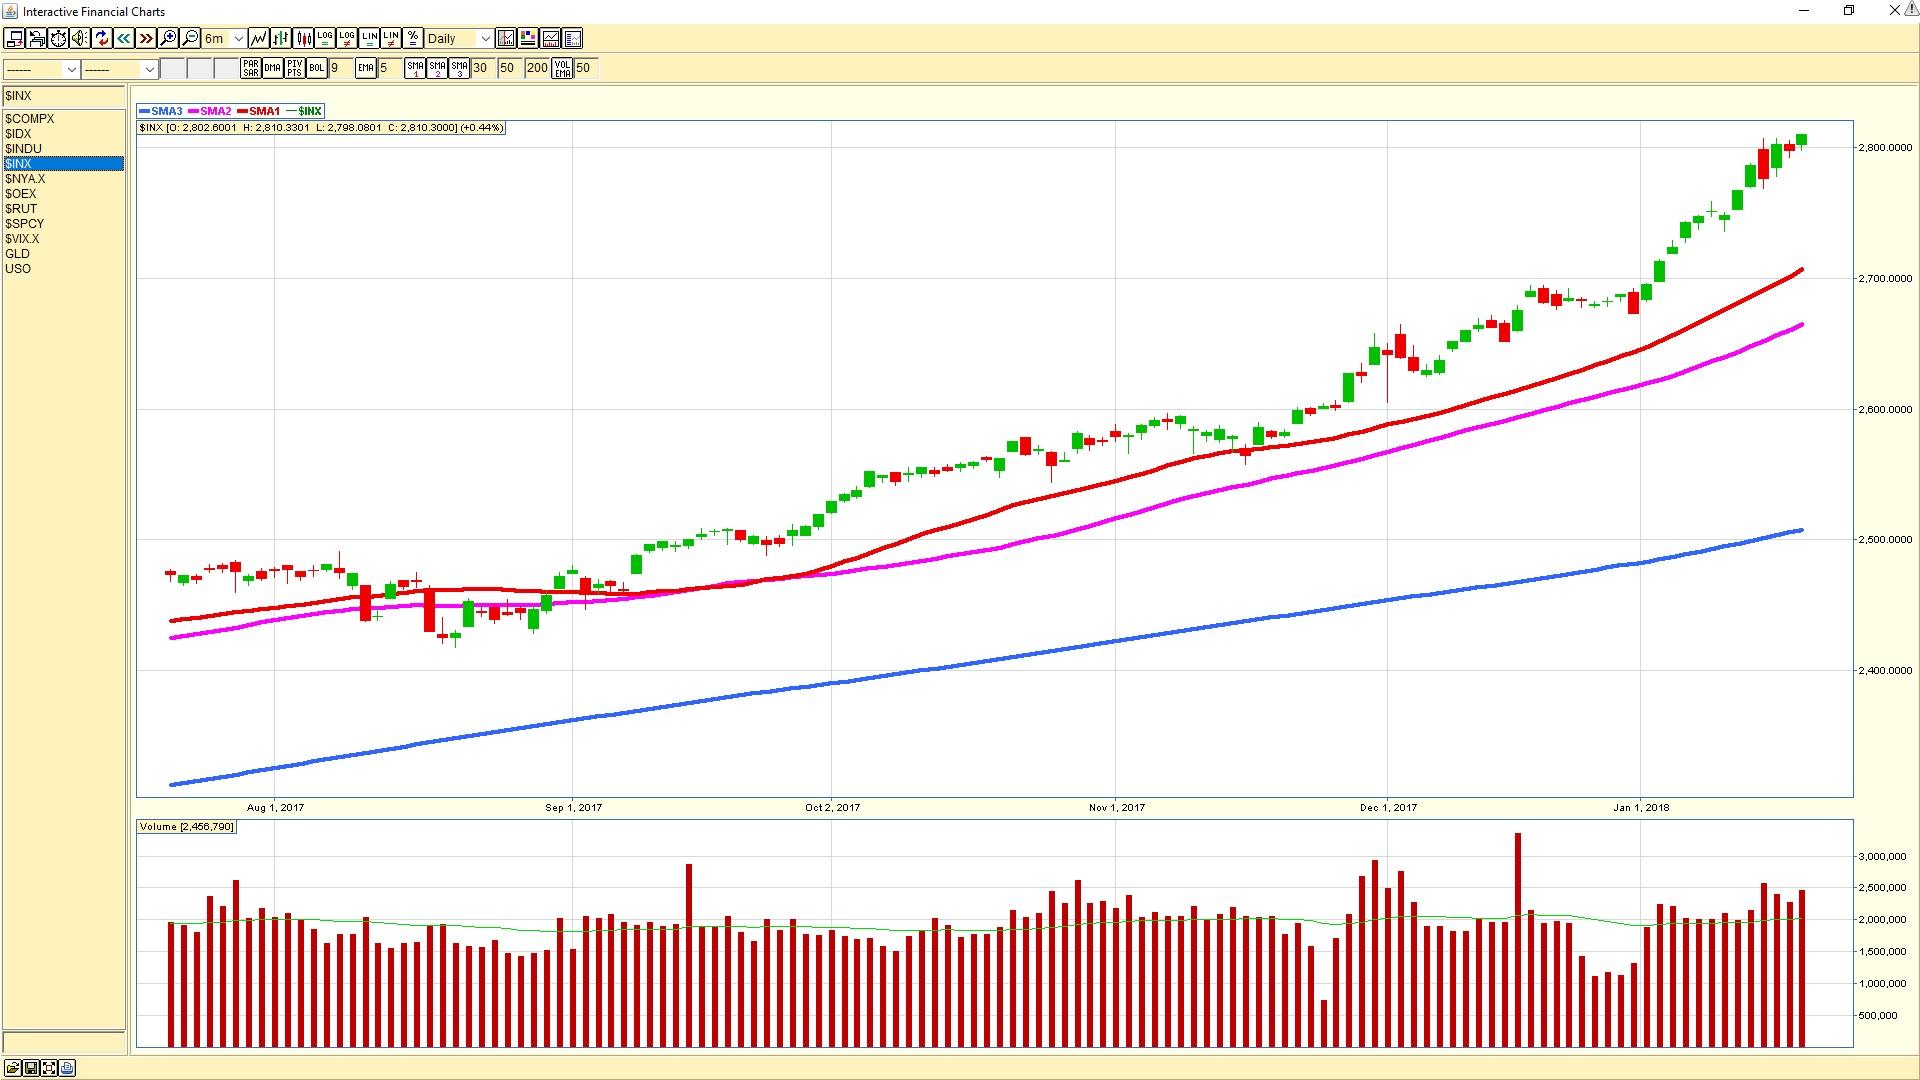 S&P 500 daily chart 20180119